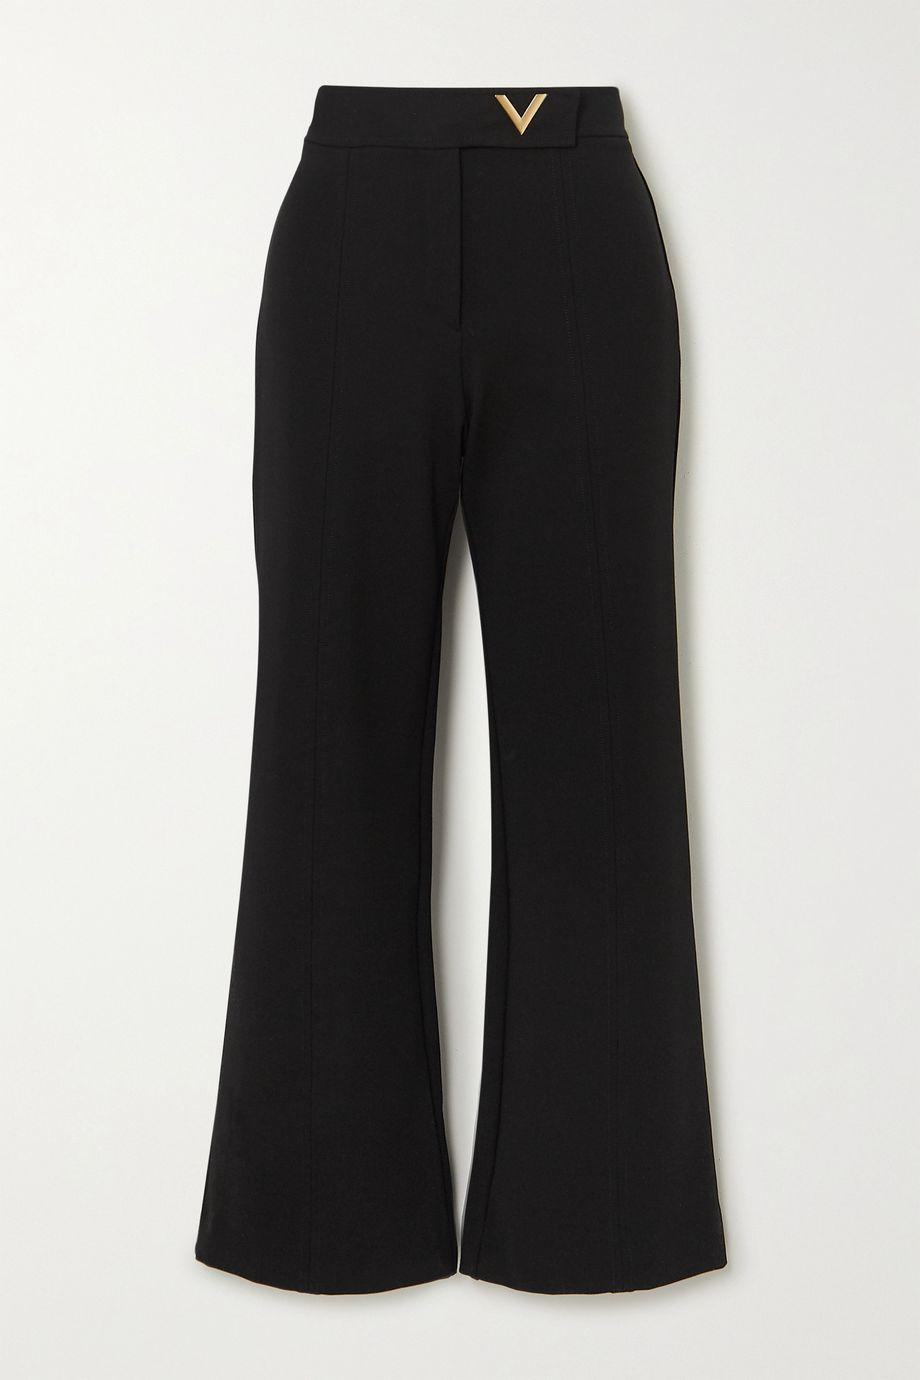 Valentino Ponte straight-leg pants